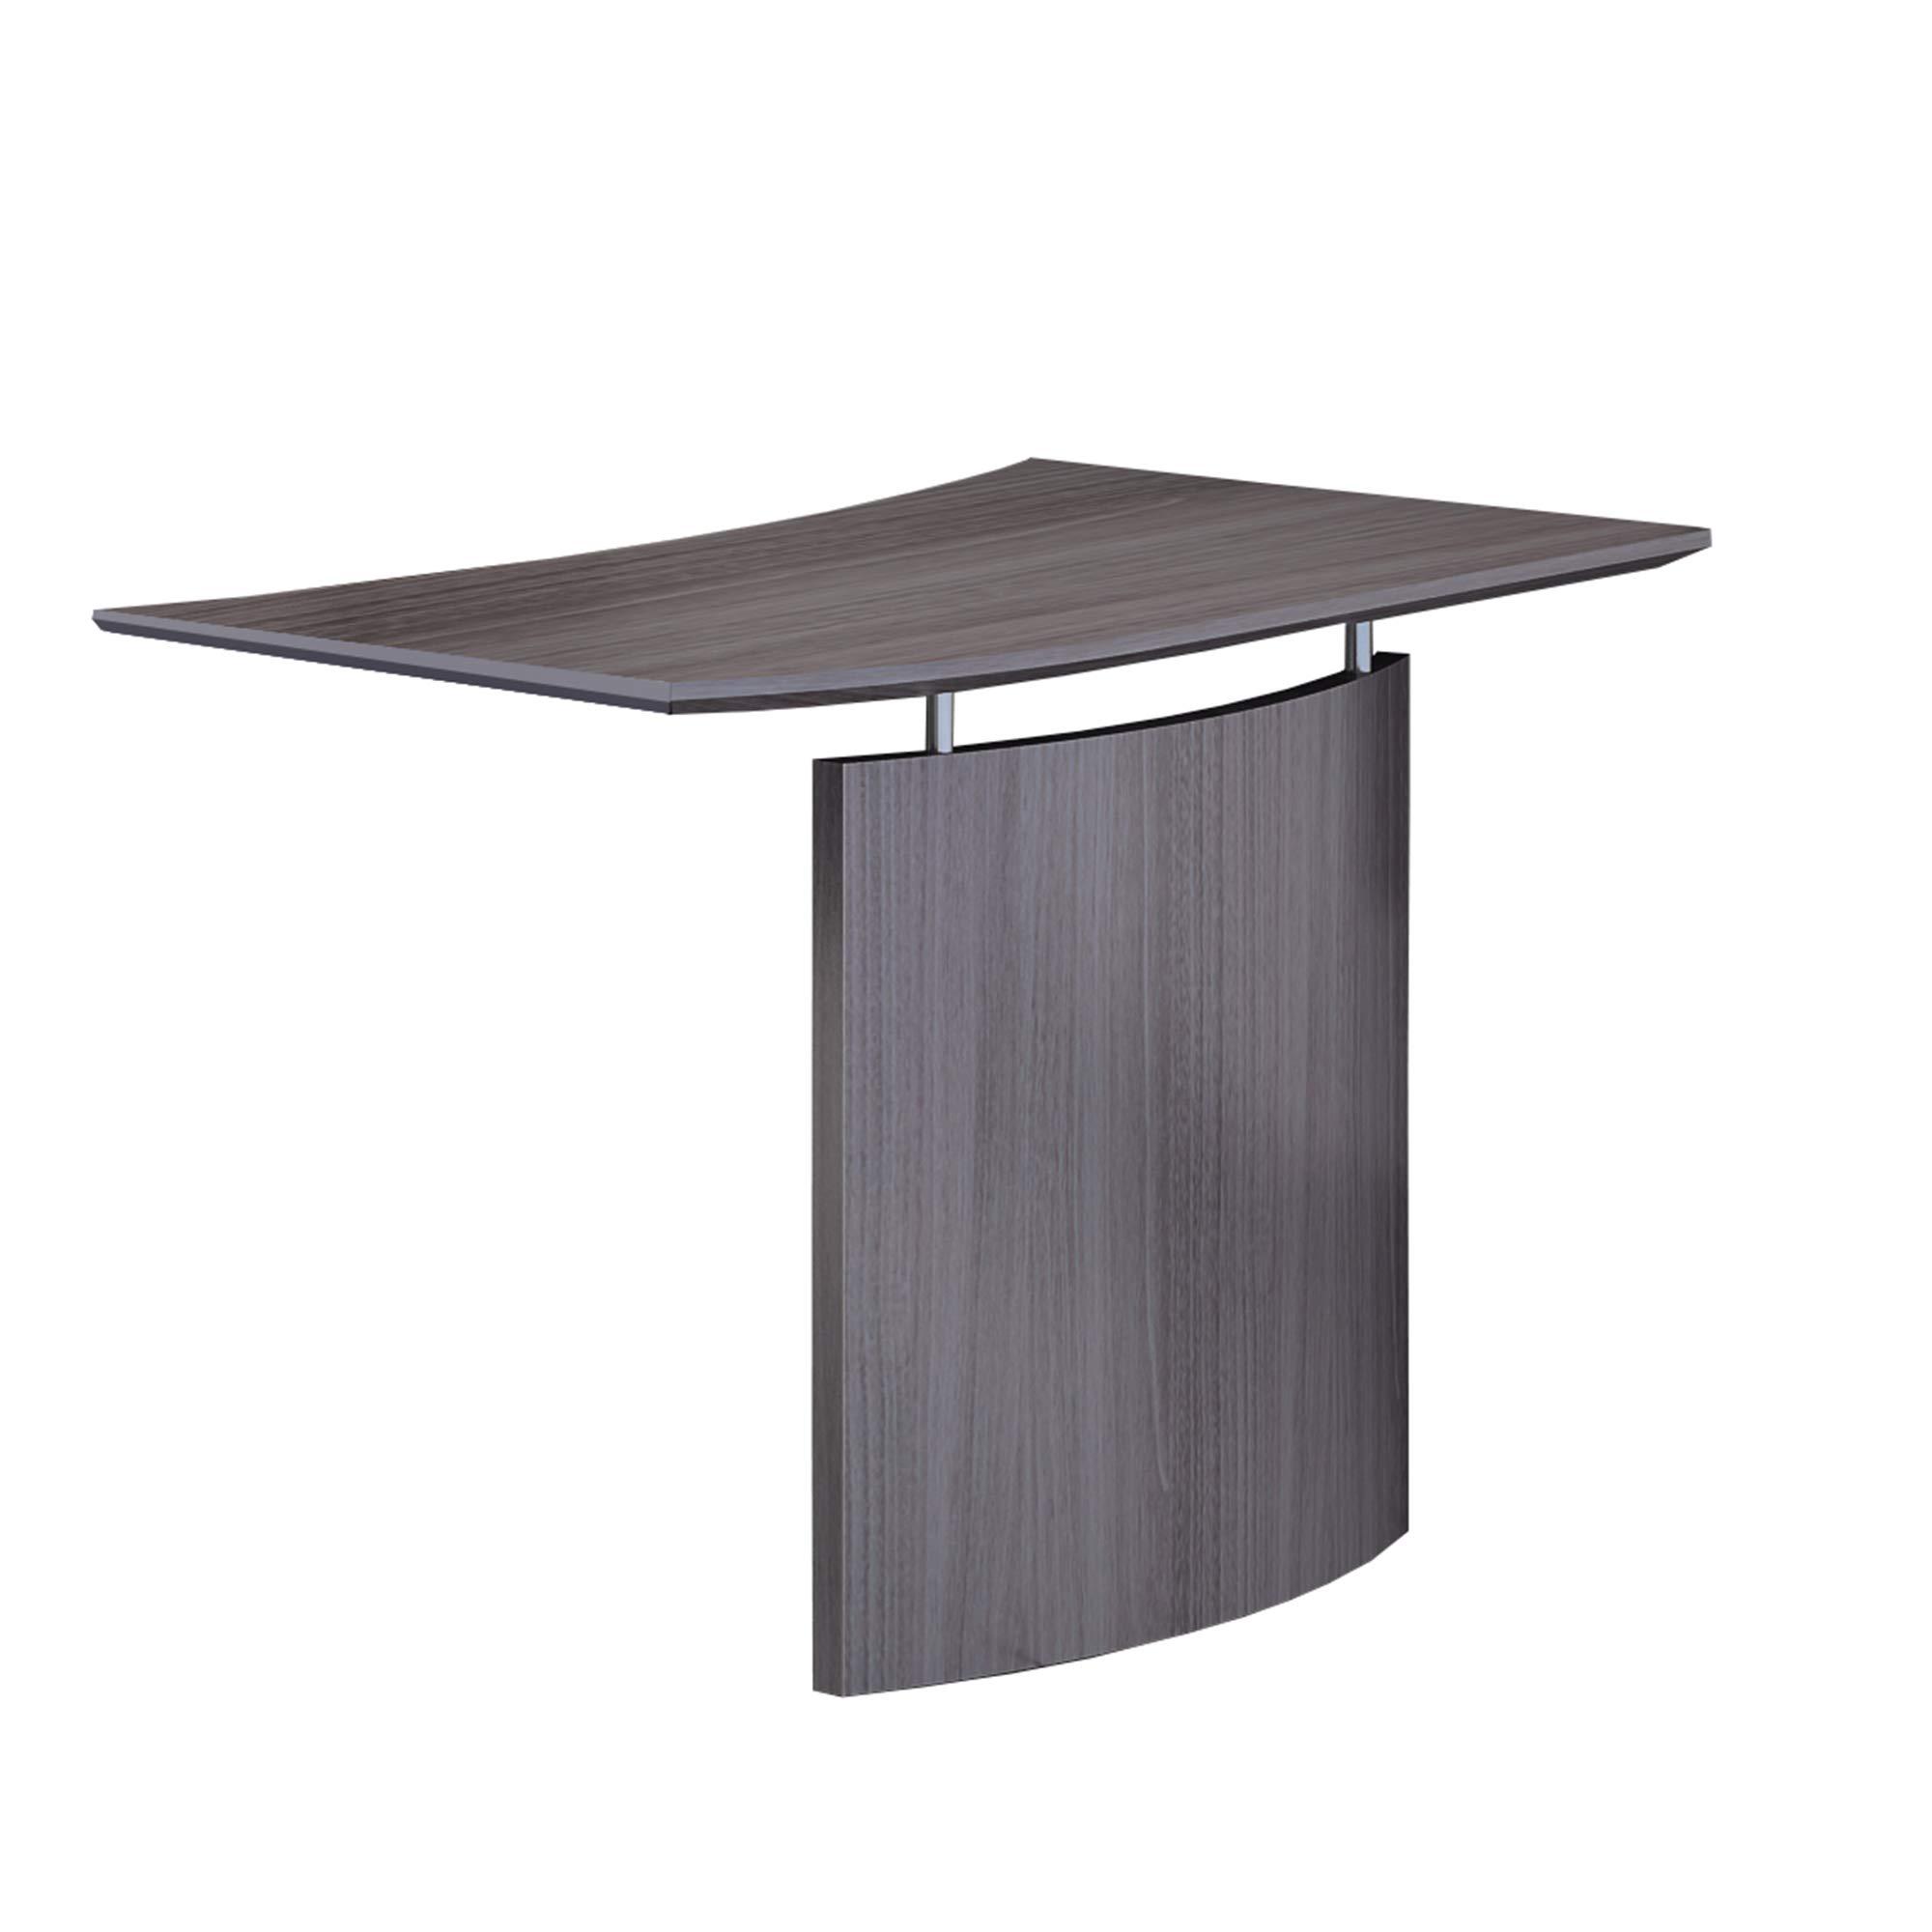 Safco MNBDGLLGS Medina Desk, Gray Steel Laminate by Safco